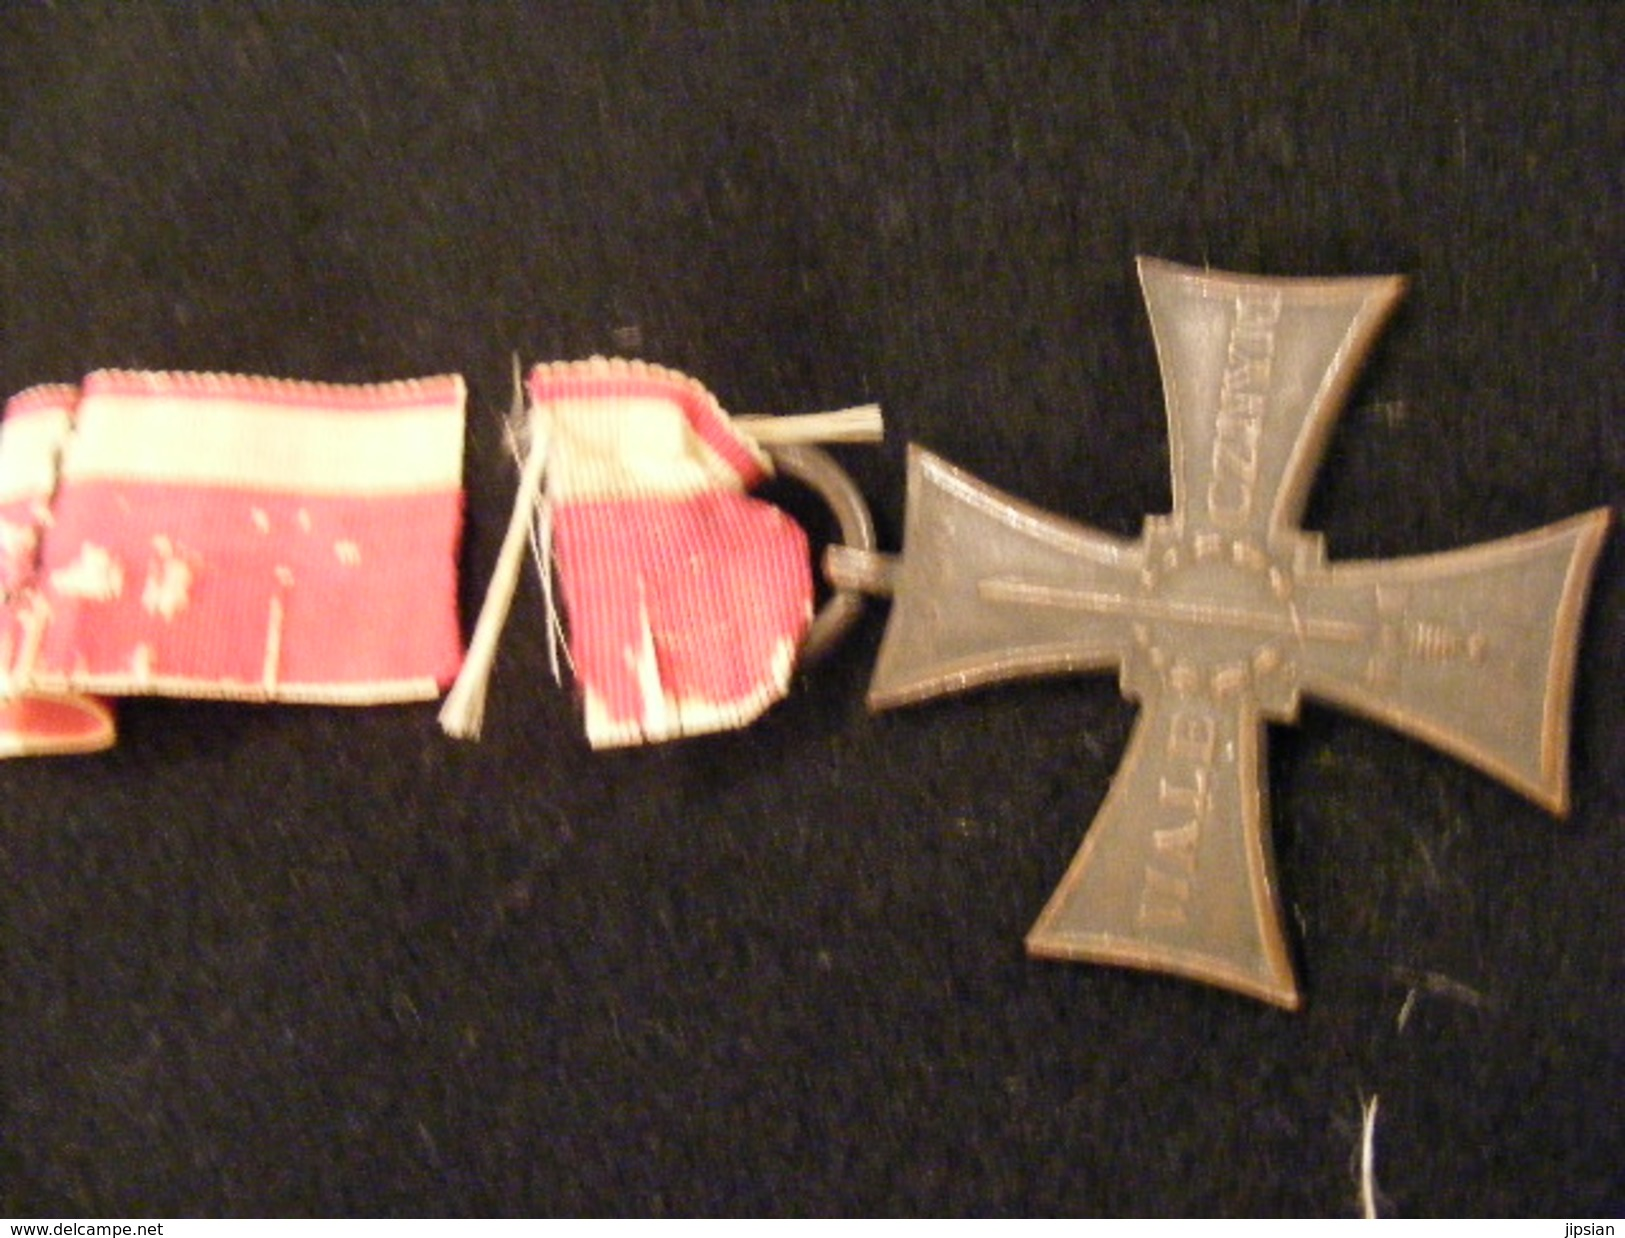 Ancienne Médaille NA 1920 Polu Chwaly - Wale Cznym N° 16279 Ordre Polonais Armée  Ins6 - Médailles & Décorations